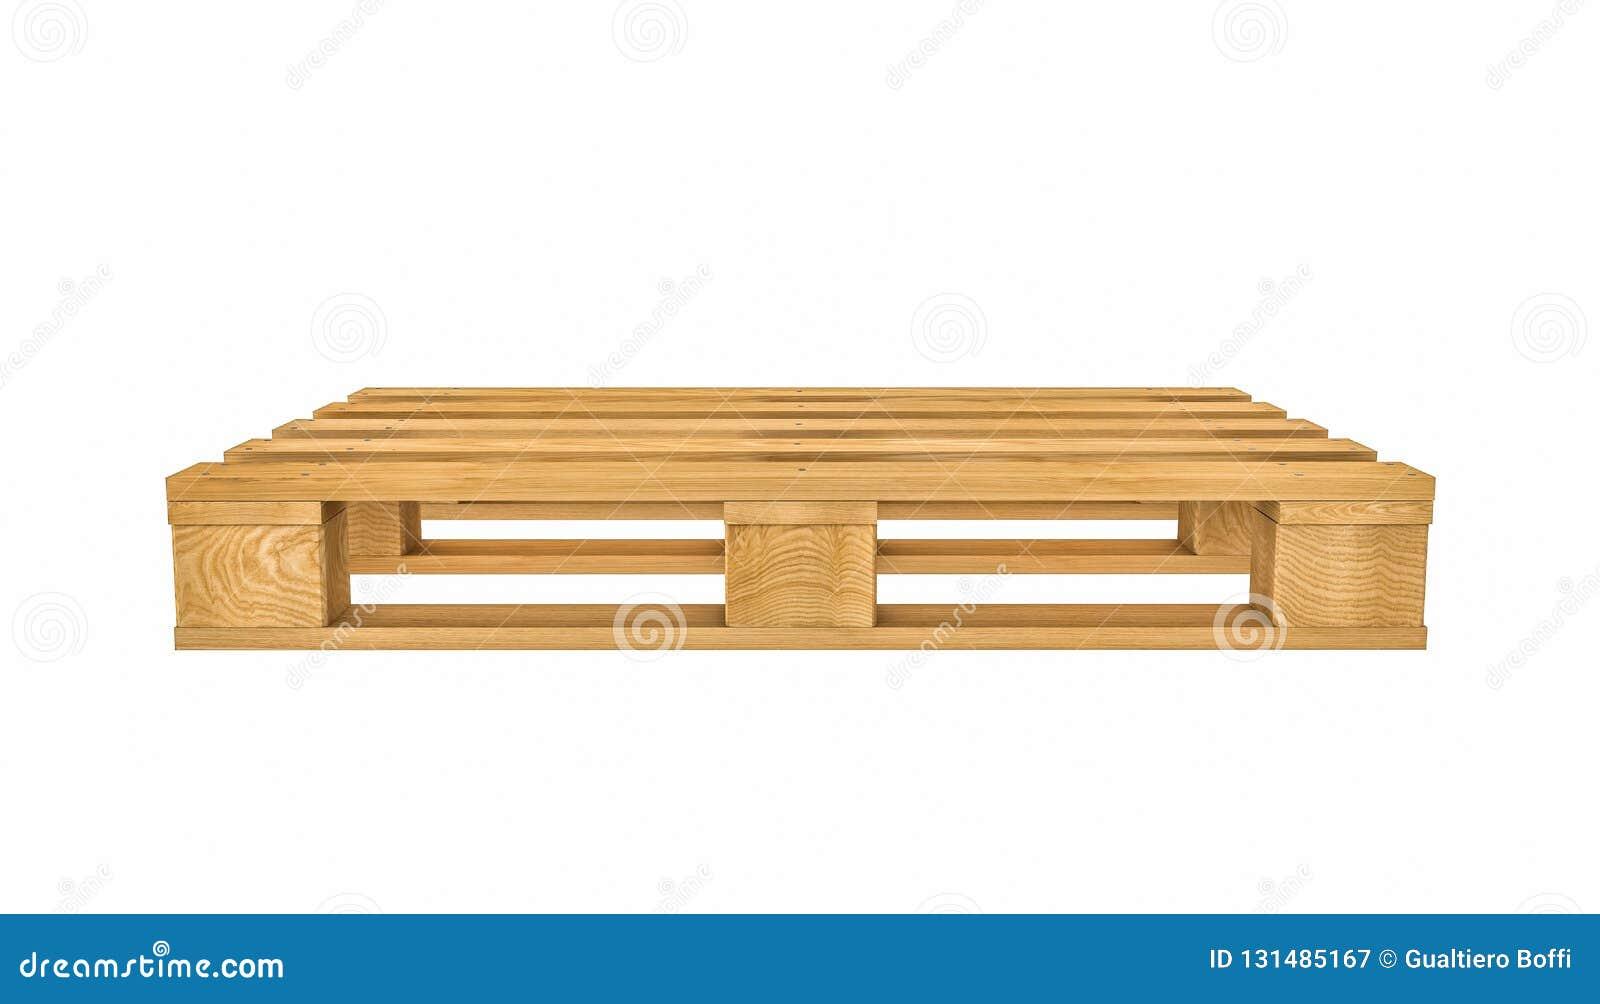 Wooden Pallet On White Background Stock Illustration